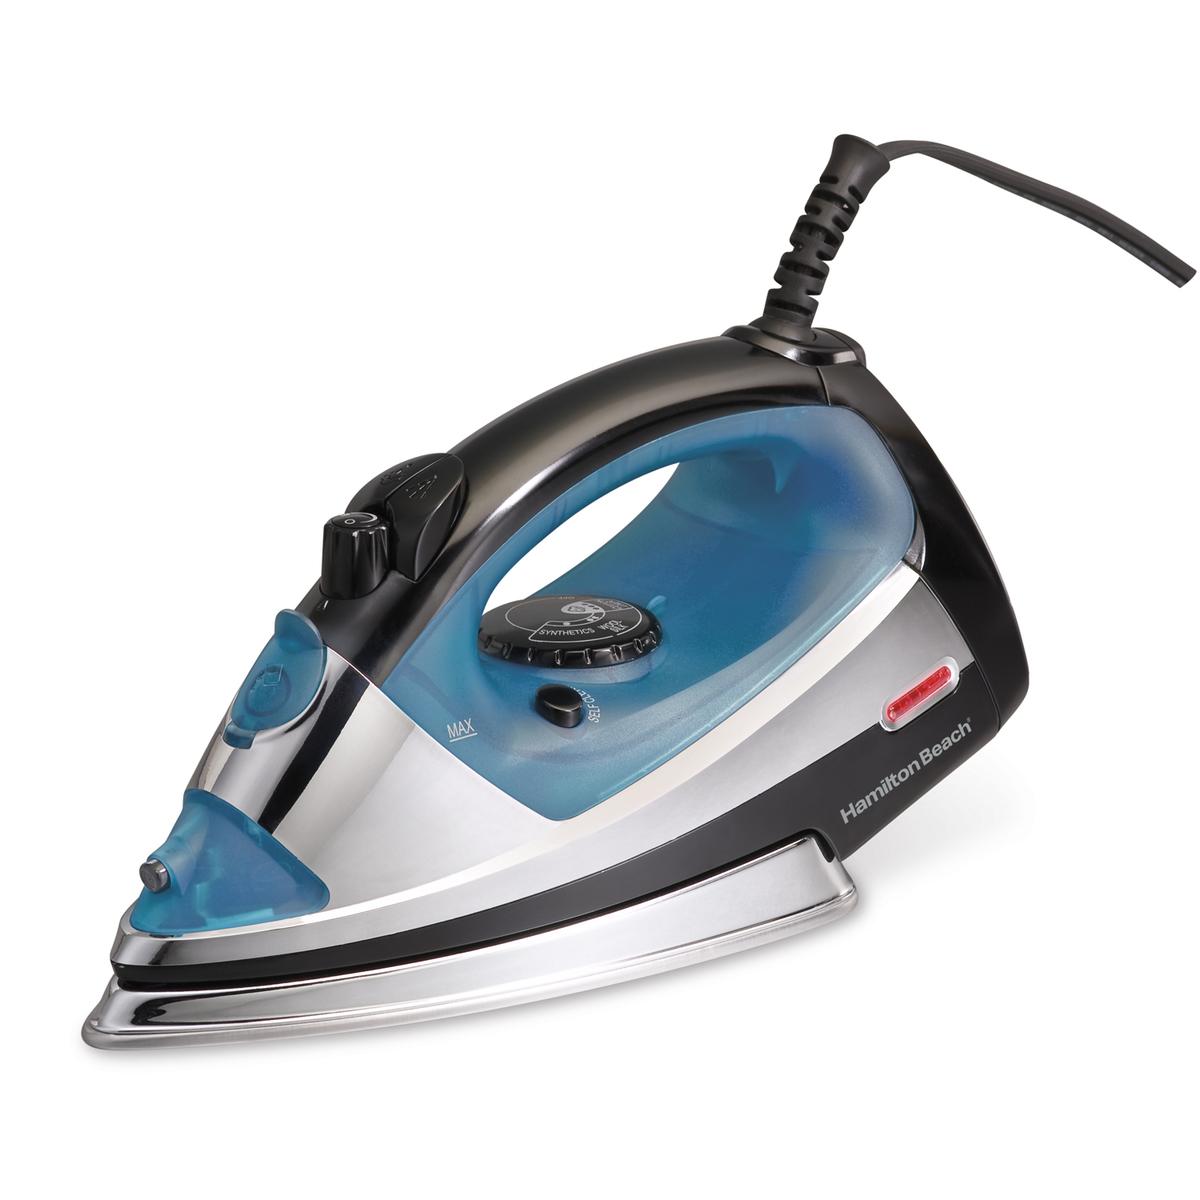 Professional Iron (14710)